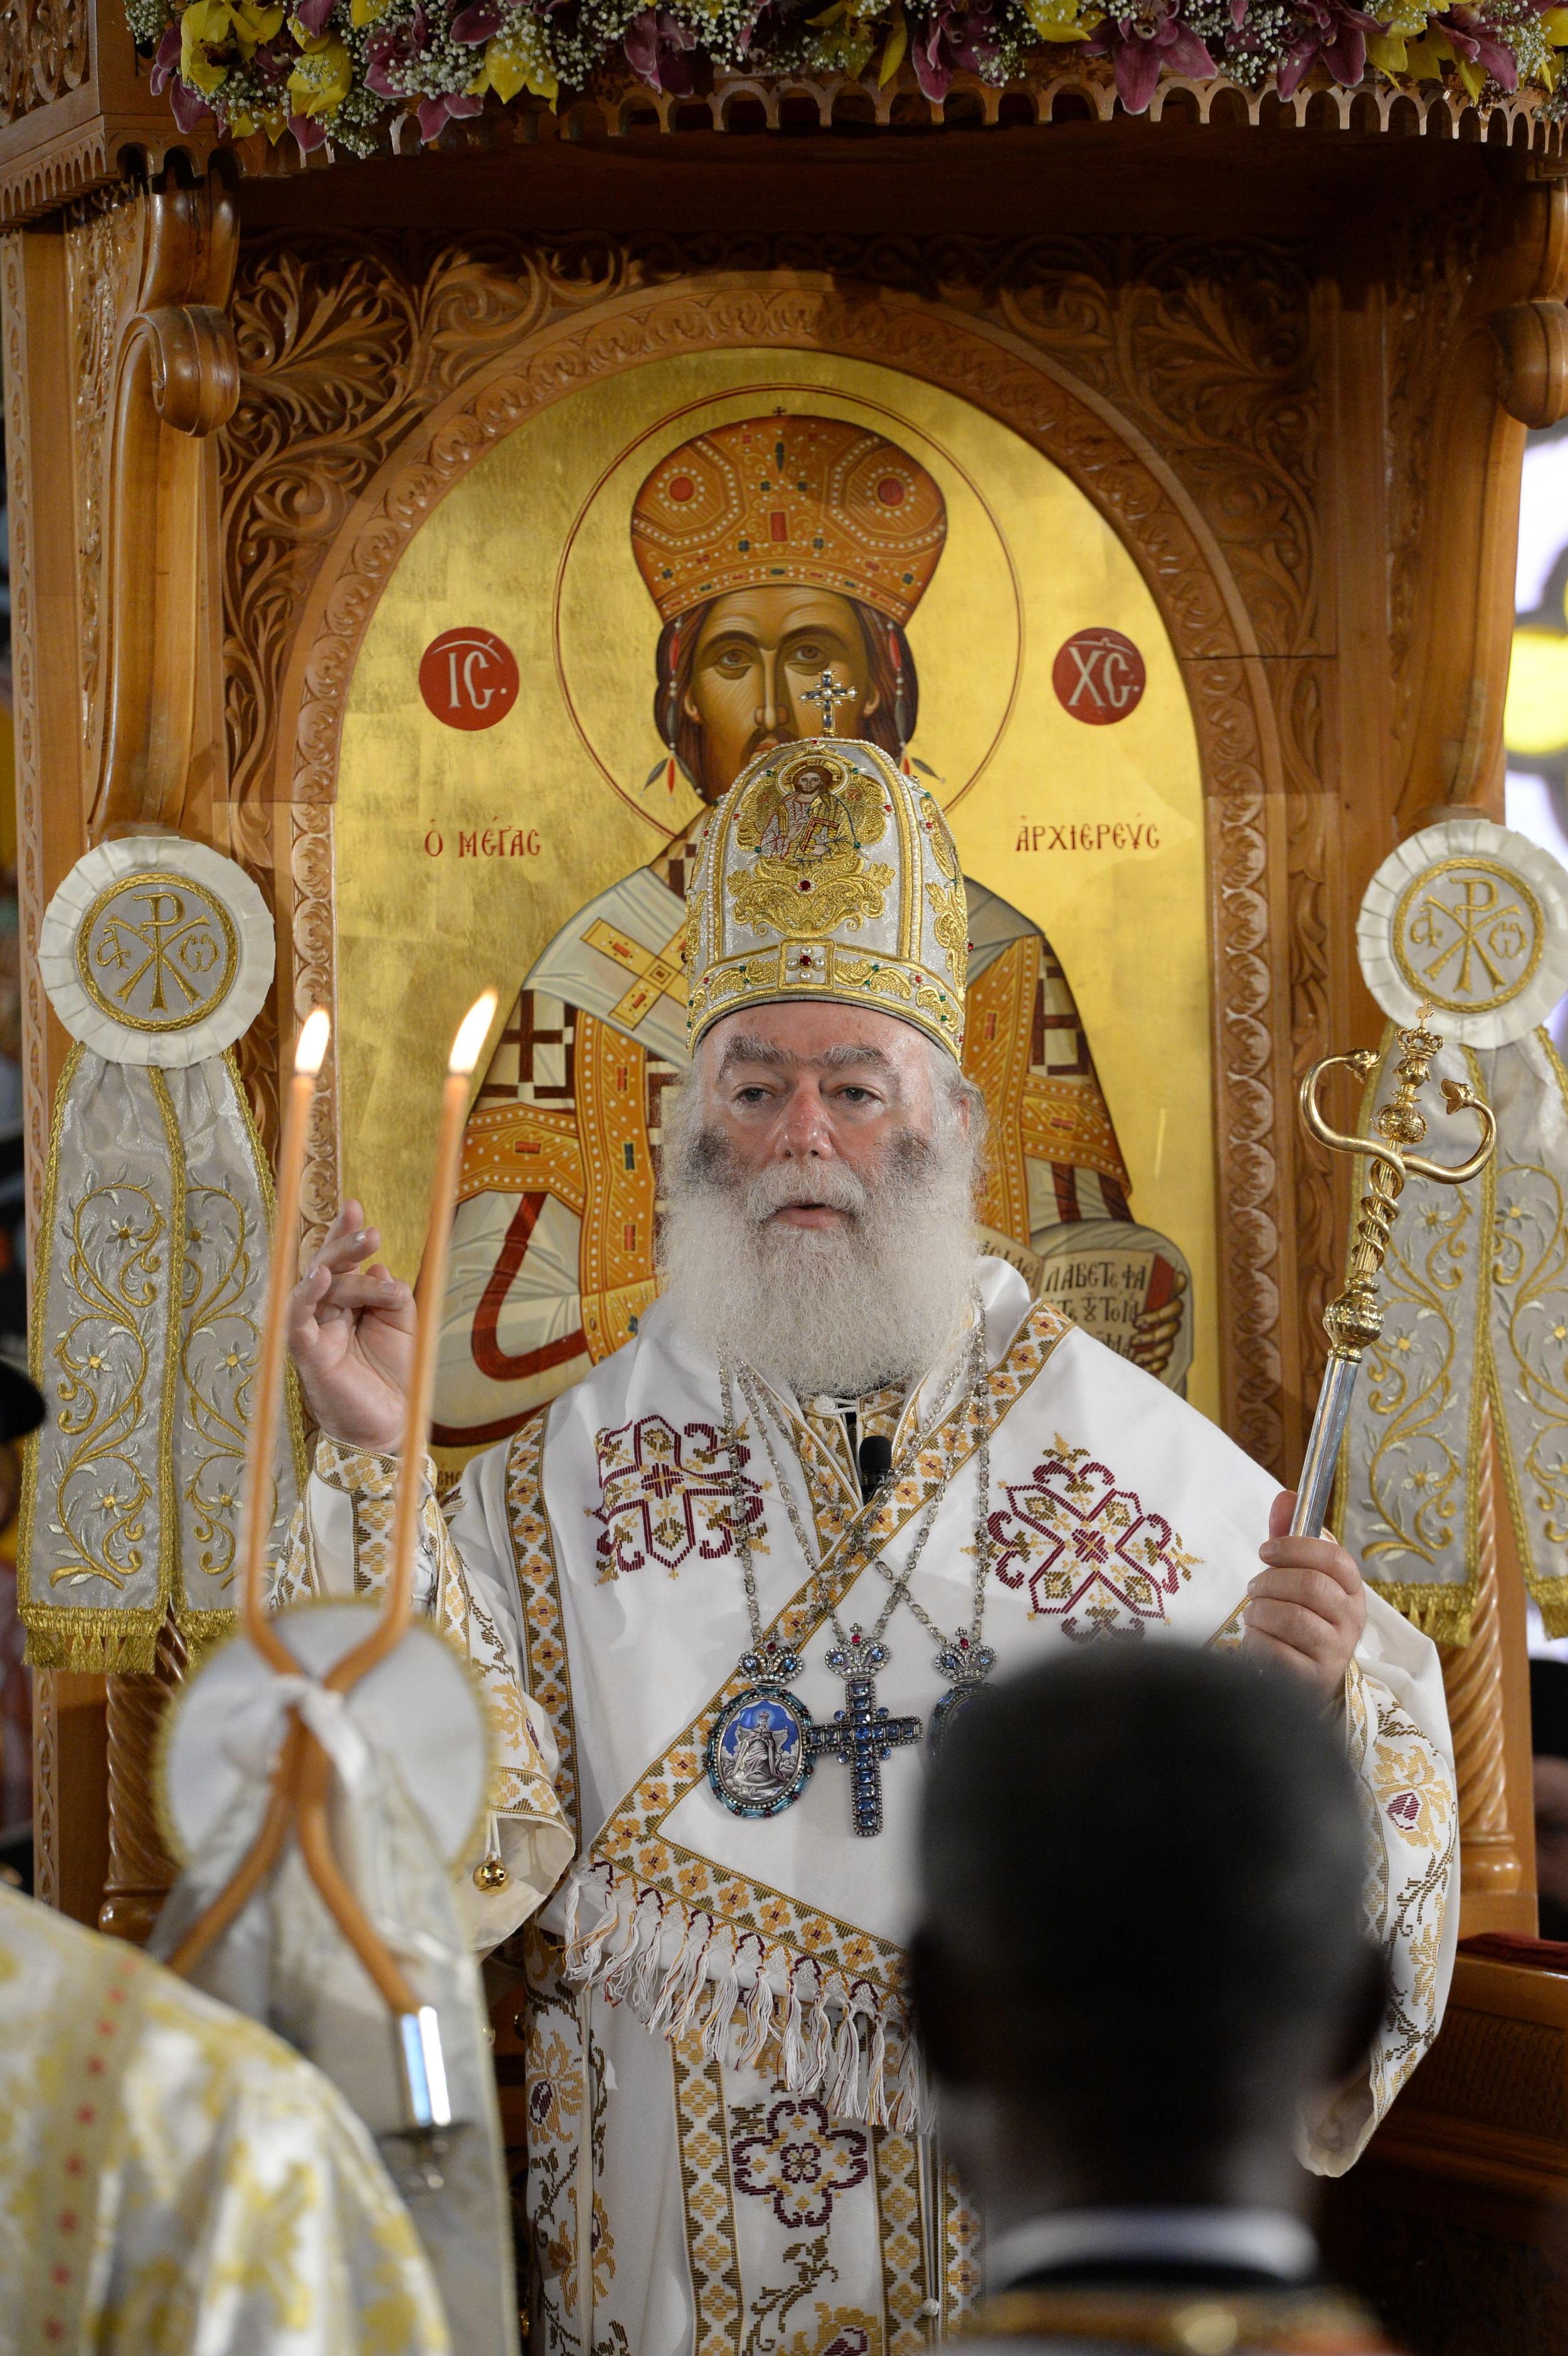 His Beatitude Patriarch Theodoros II of Alexandria presides over the Divine Liturgy at the Annunciation Church in Kissamos, Crete. PHOTO: © John Mindala